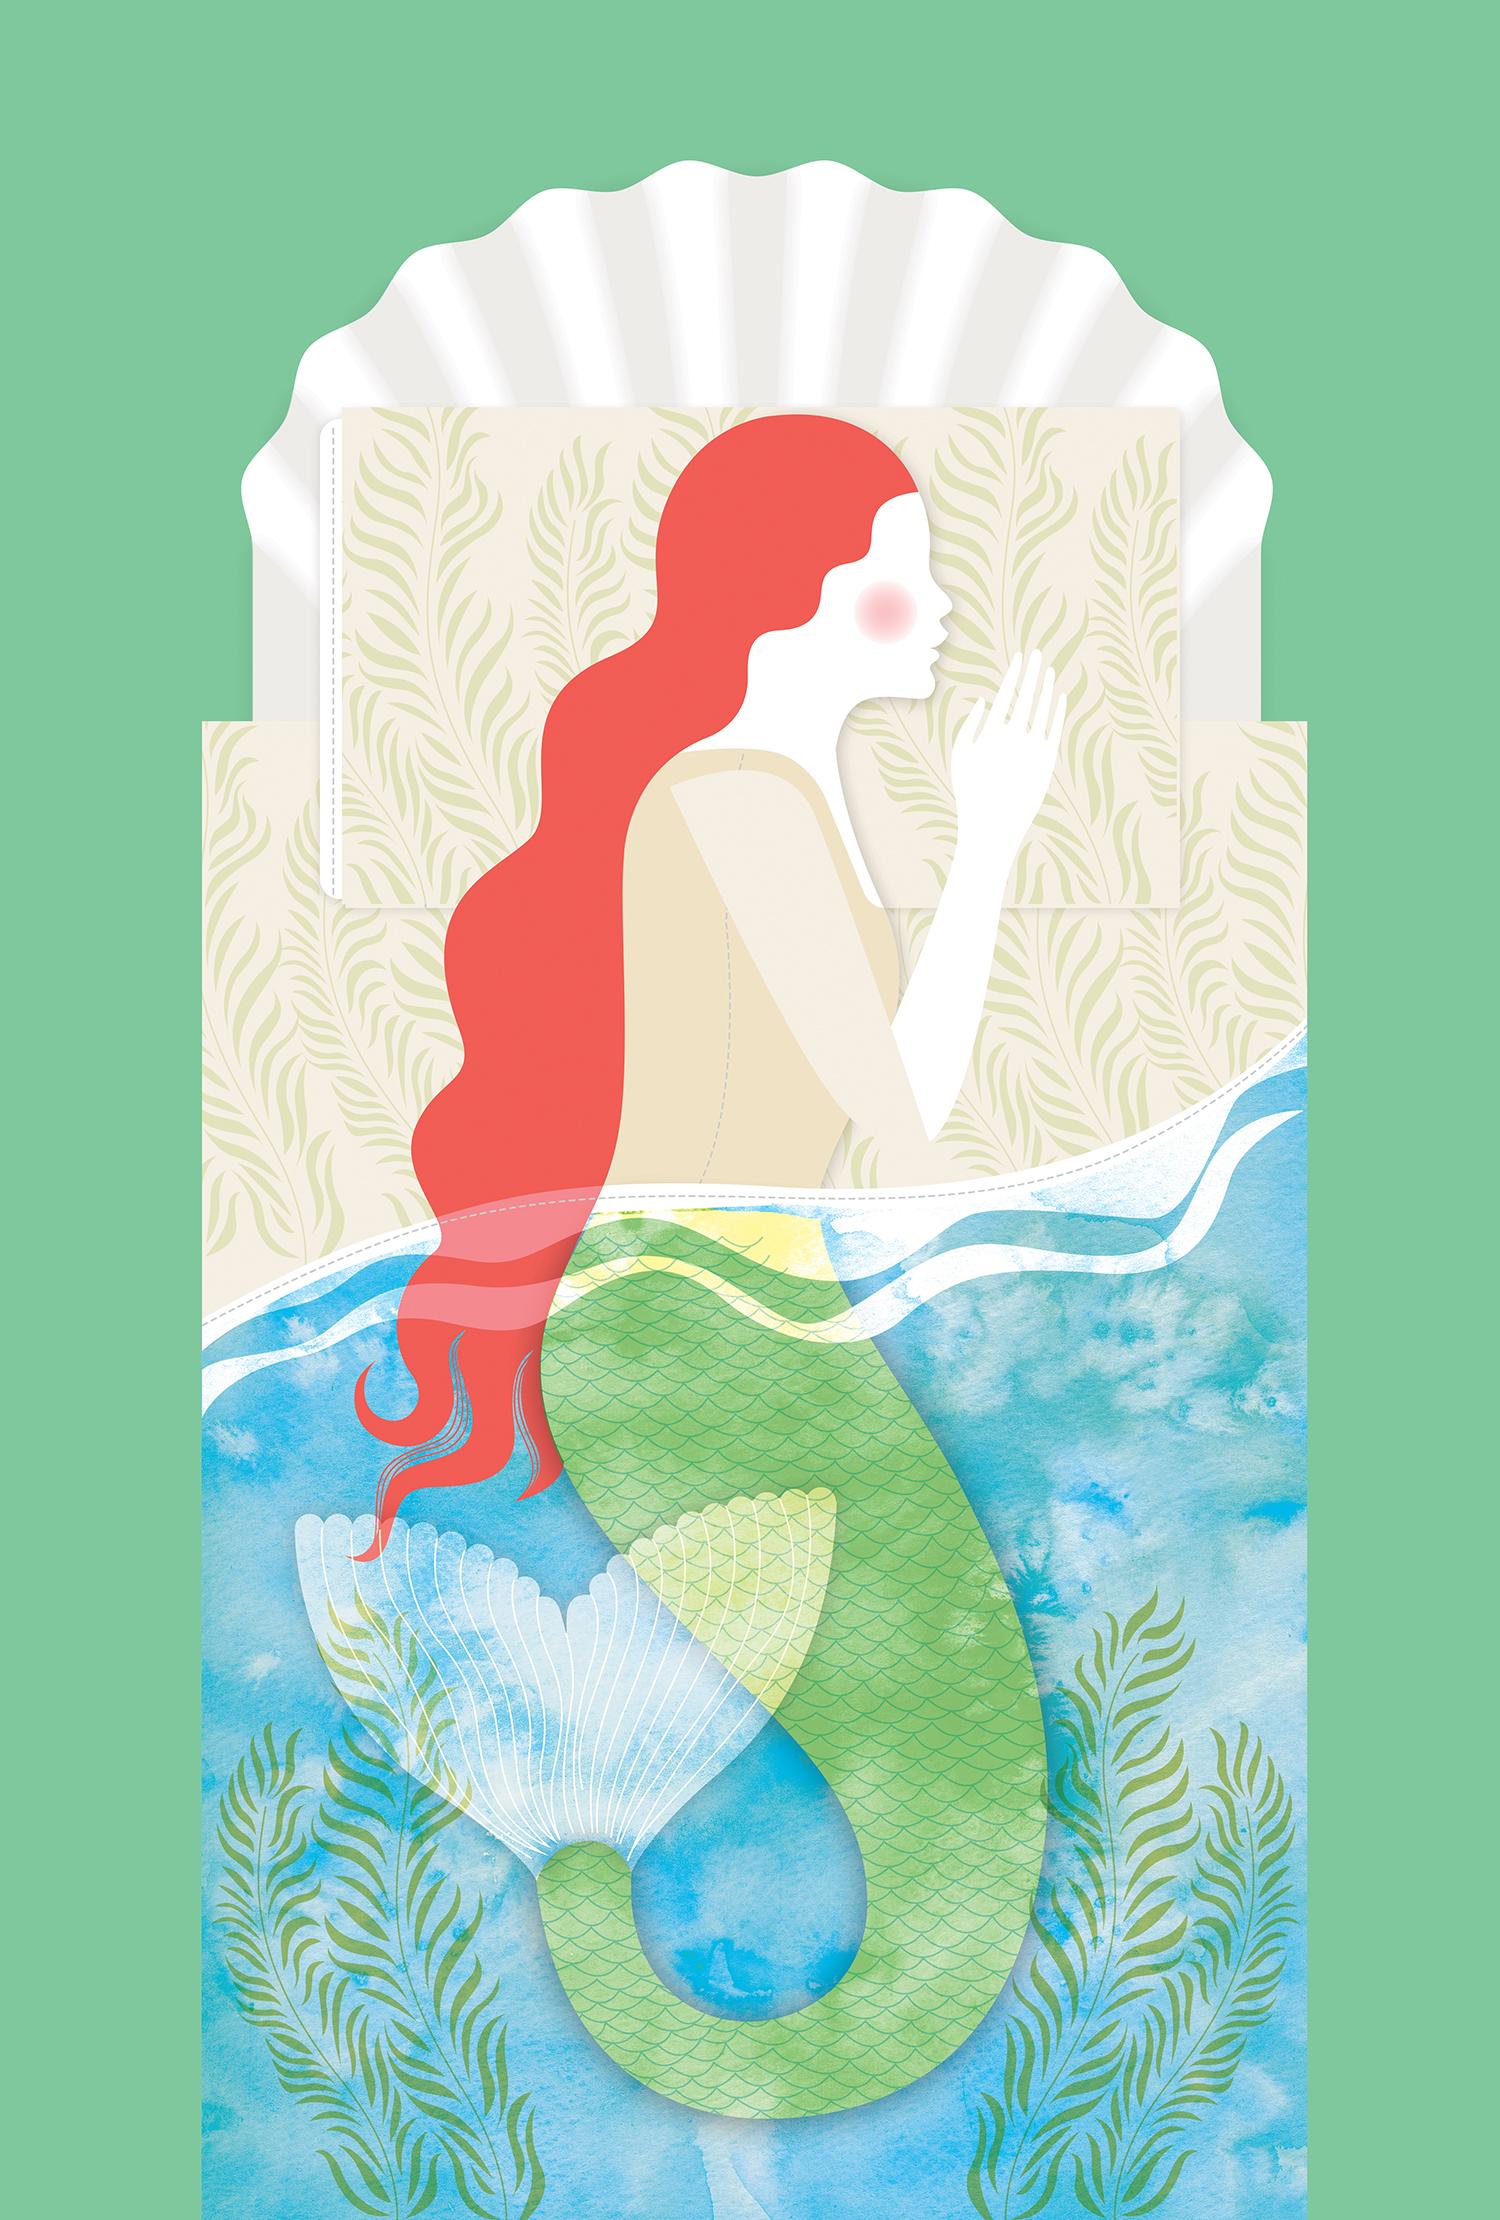 SOI 58 2015 - ARTIST: Eleanor GroschTITLE: Fairy Tale Series [3 of 6]